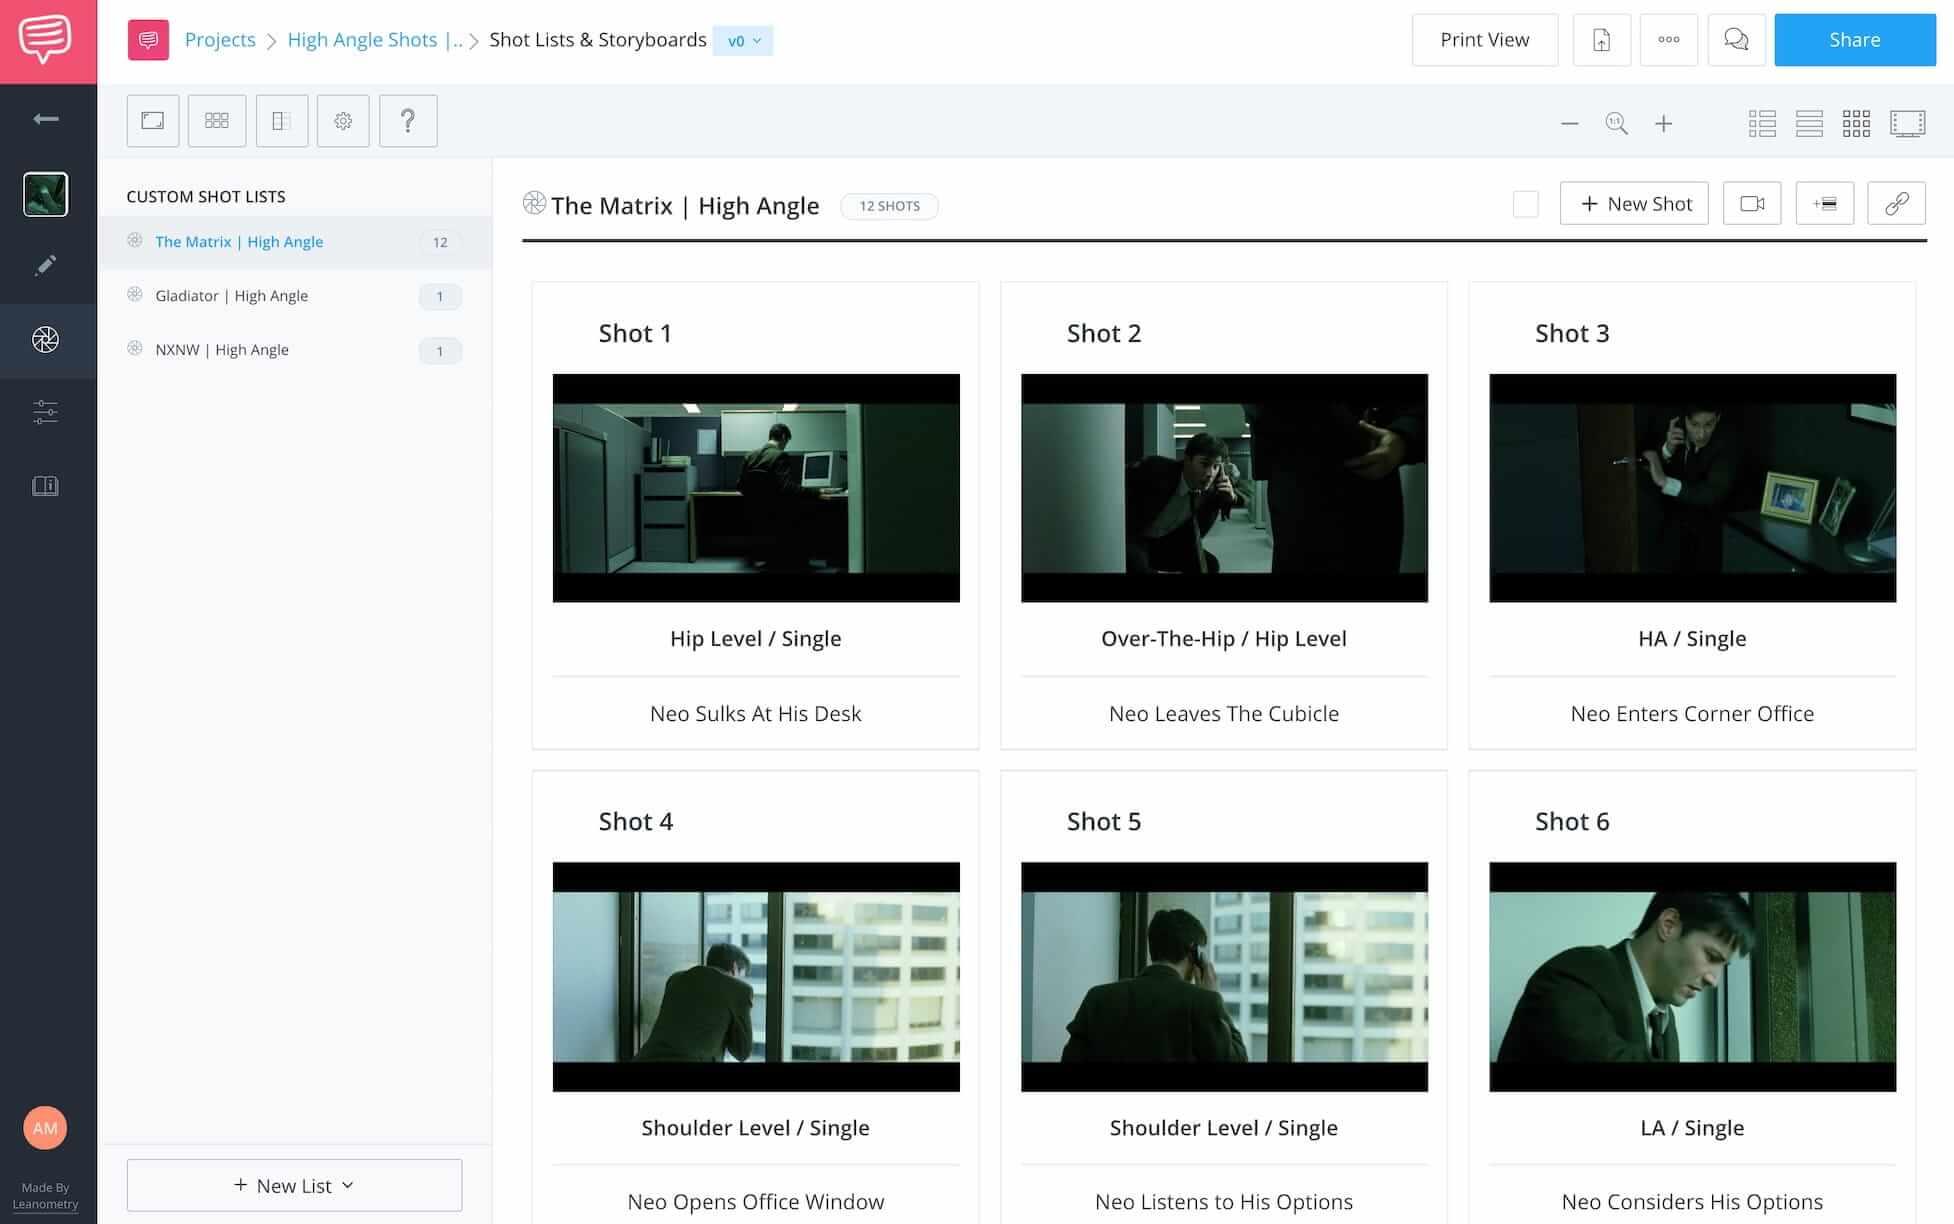 High Angle Shot - The Matrix - StudioBinder Online Shot List Software